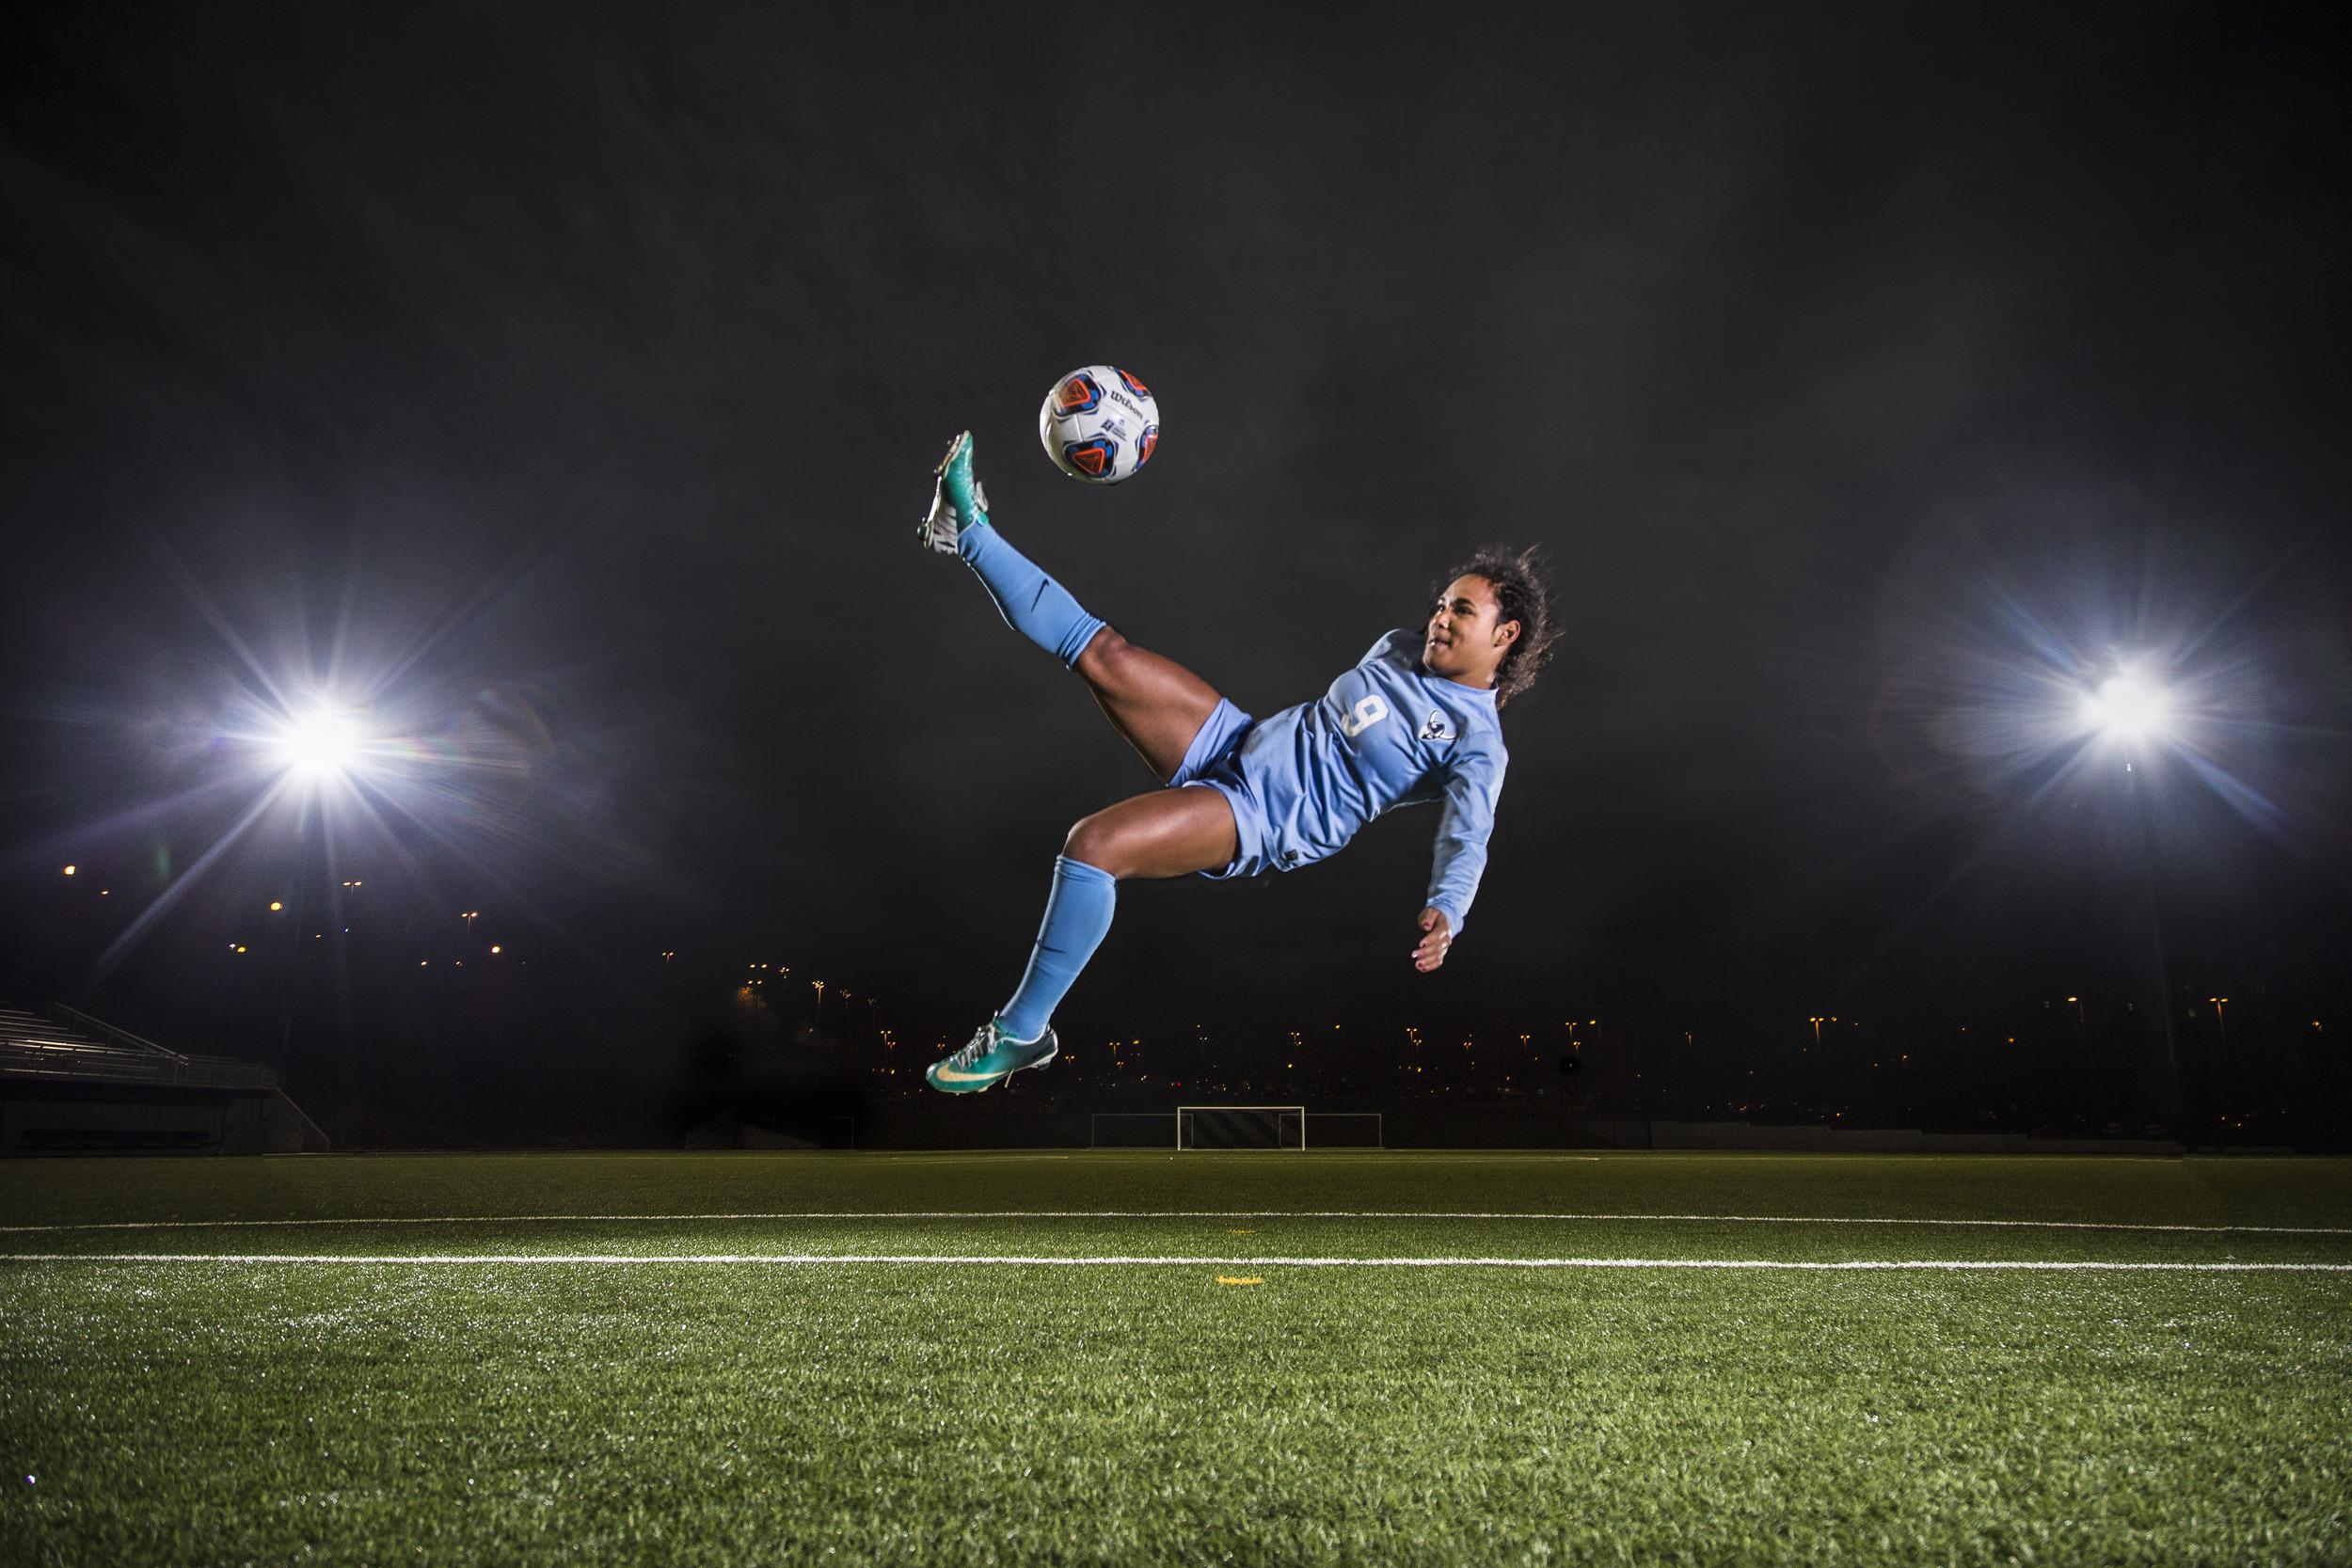 Gabriela Pelogi was one of the lead scorers during the 2015 Western Washington University women's soccer season.